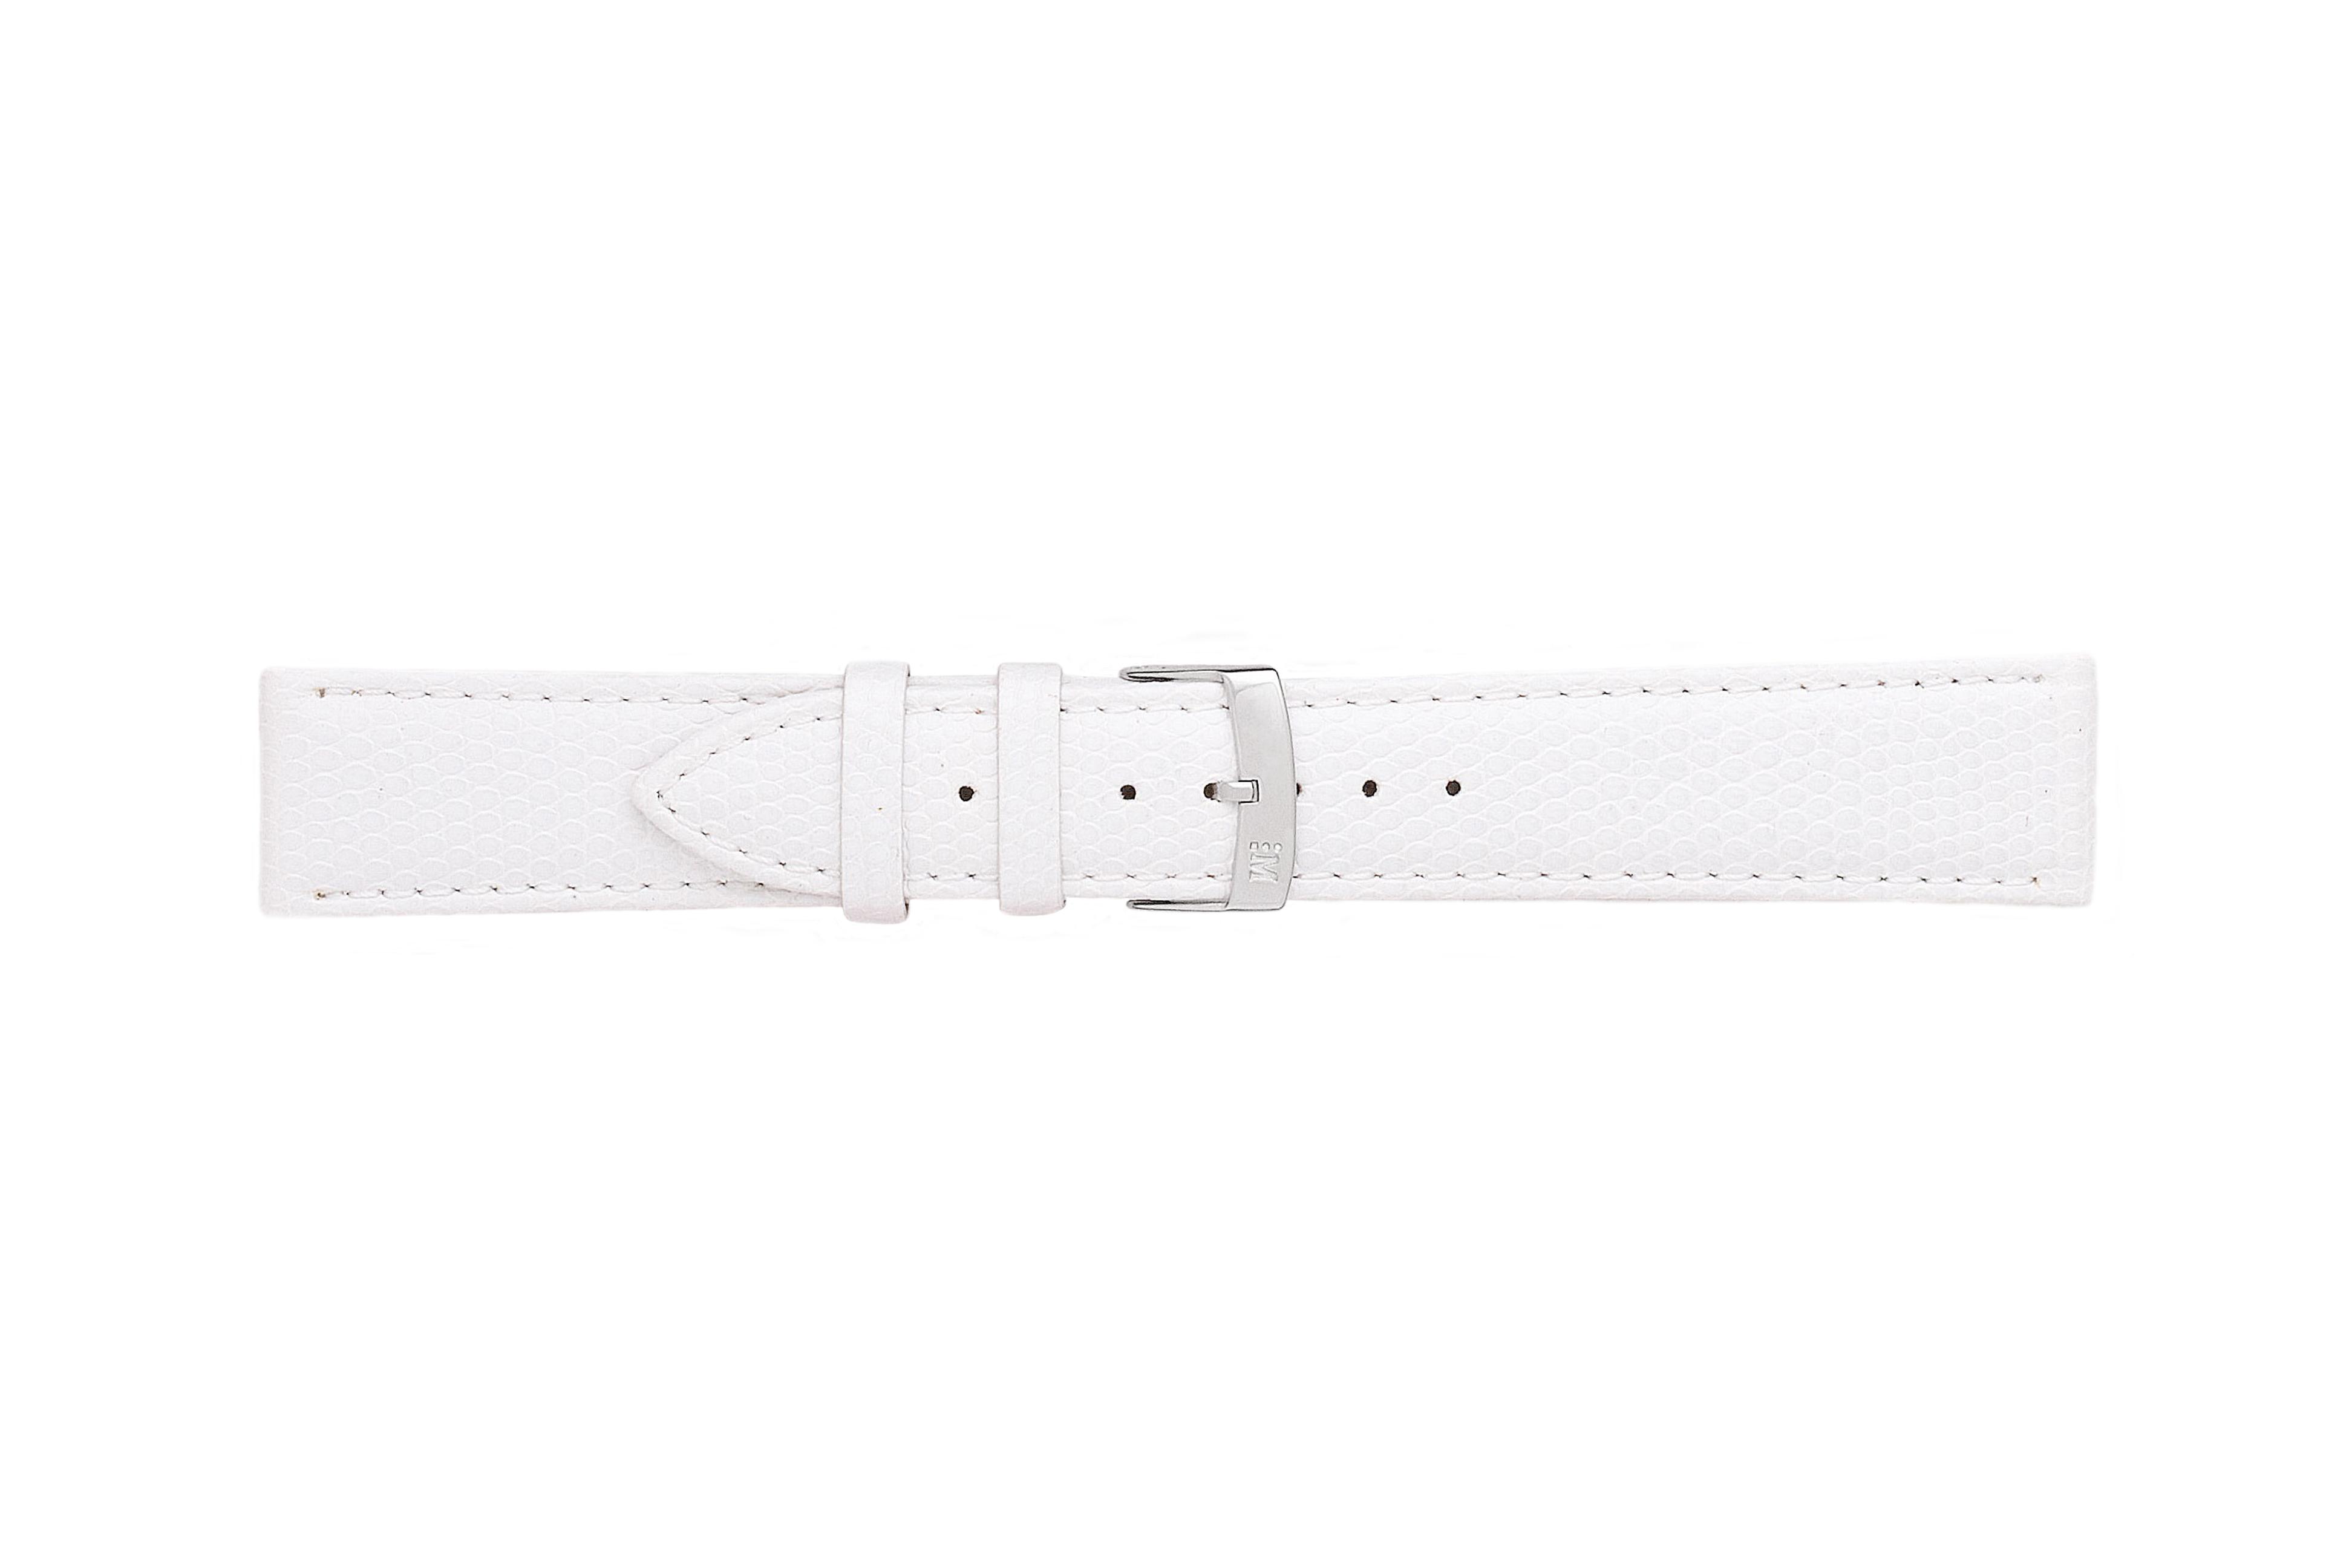 Morellato horlogeband Ibiza X3266773017CR12 / PMX017IBIZA12 Hagedissenleer Wit 12mm + standaard stiksel